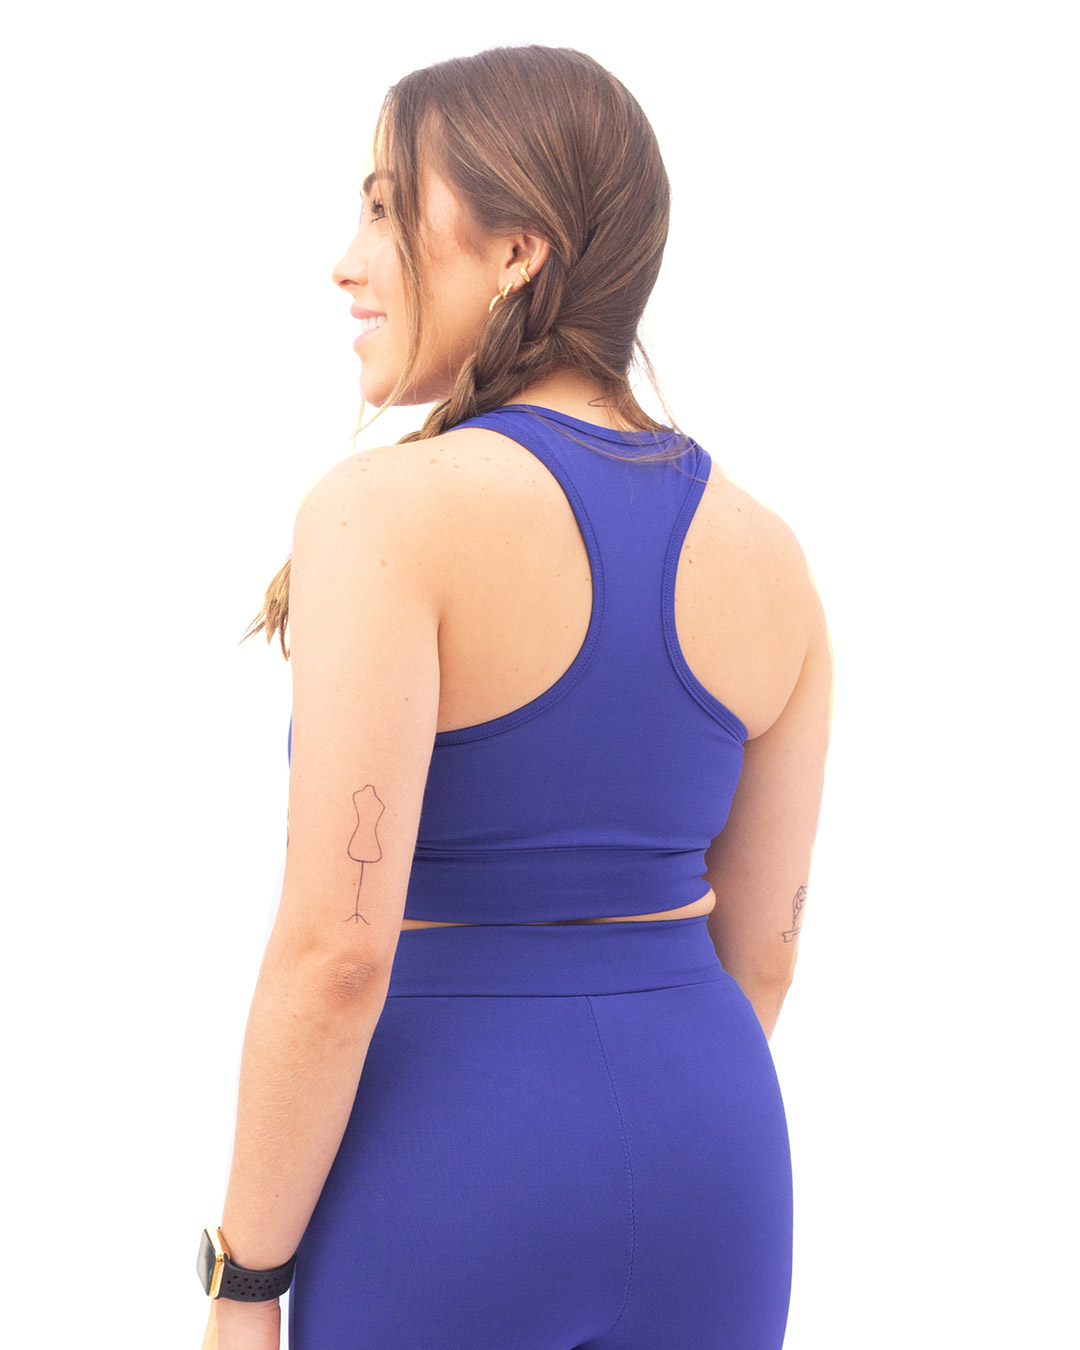 Top Fitness Nadador Azul Forrado - Movimente-se